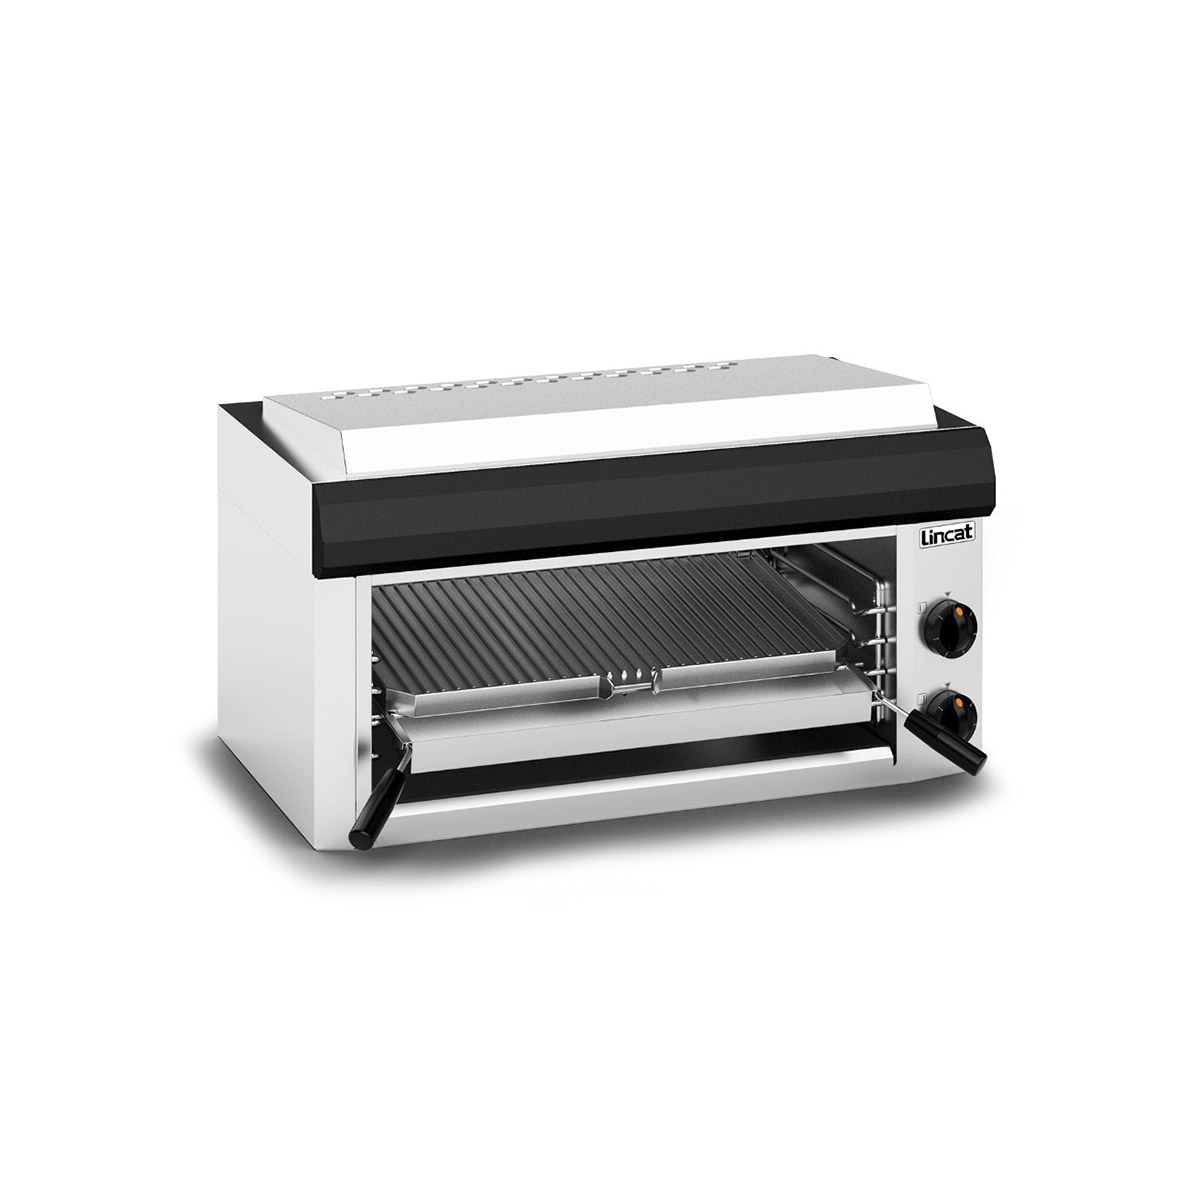 Lincat Opus 800 Electric Salamander Grill Model: OE8303